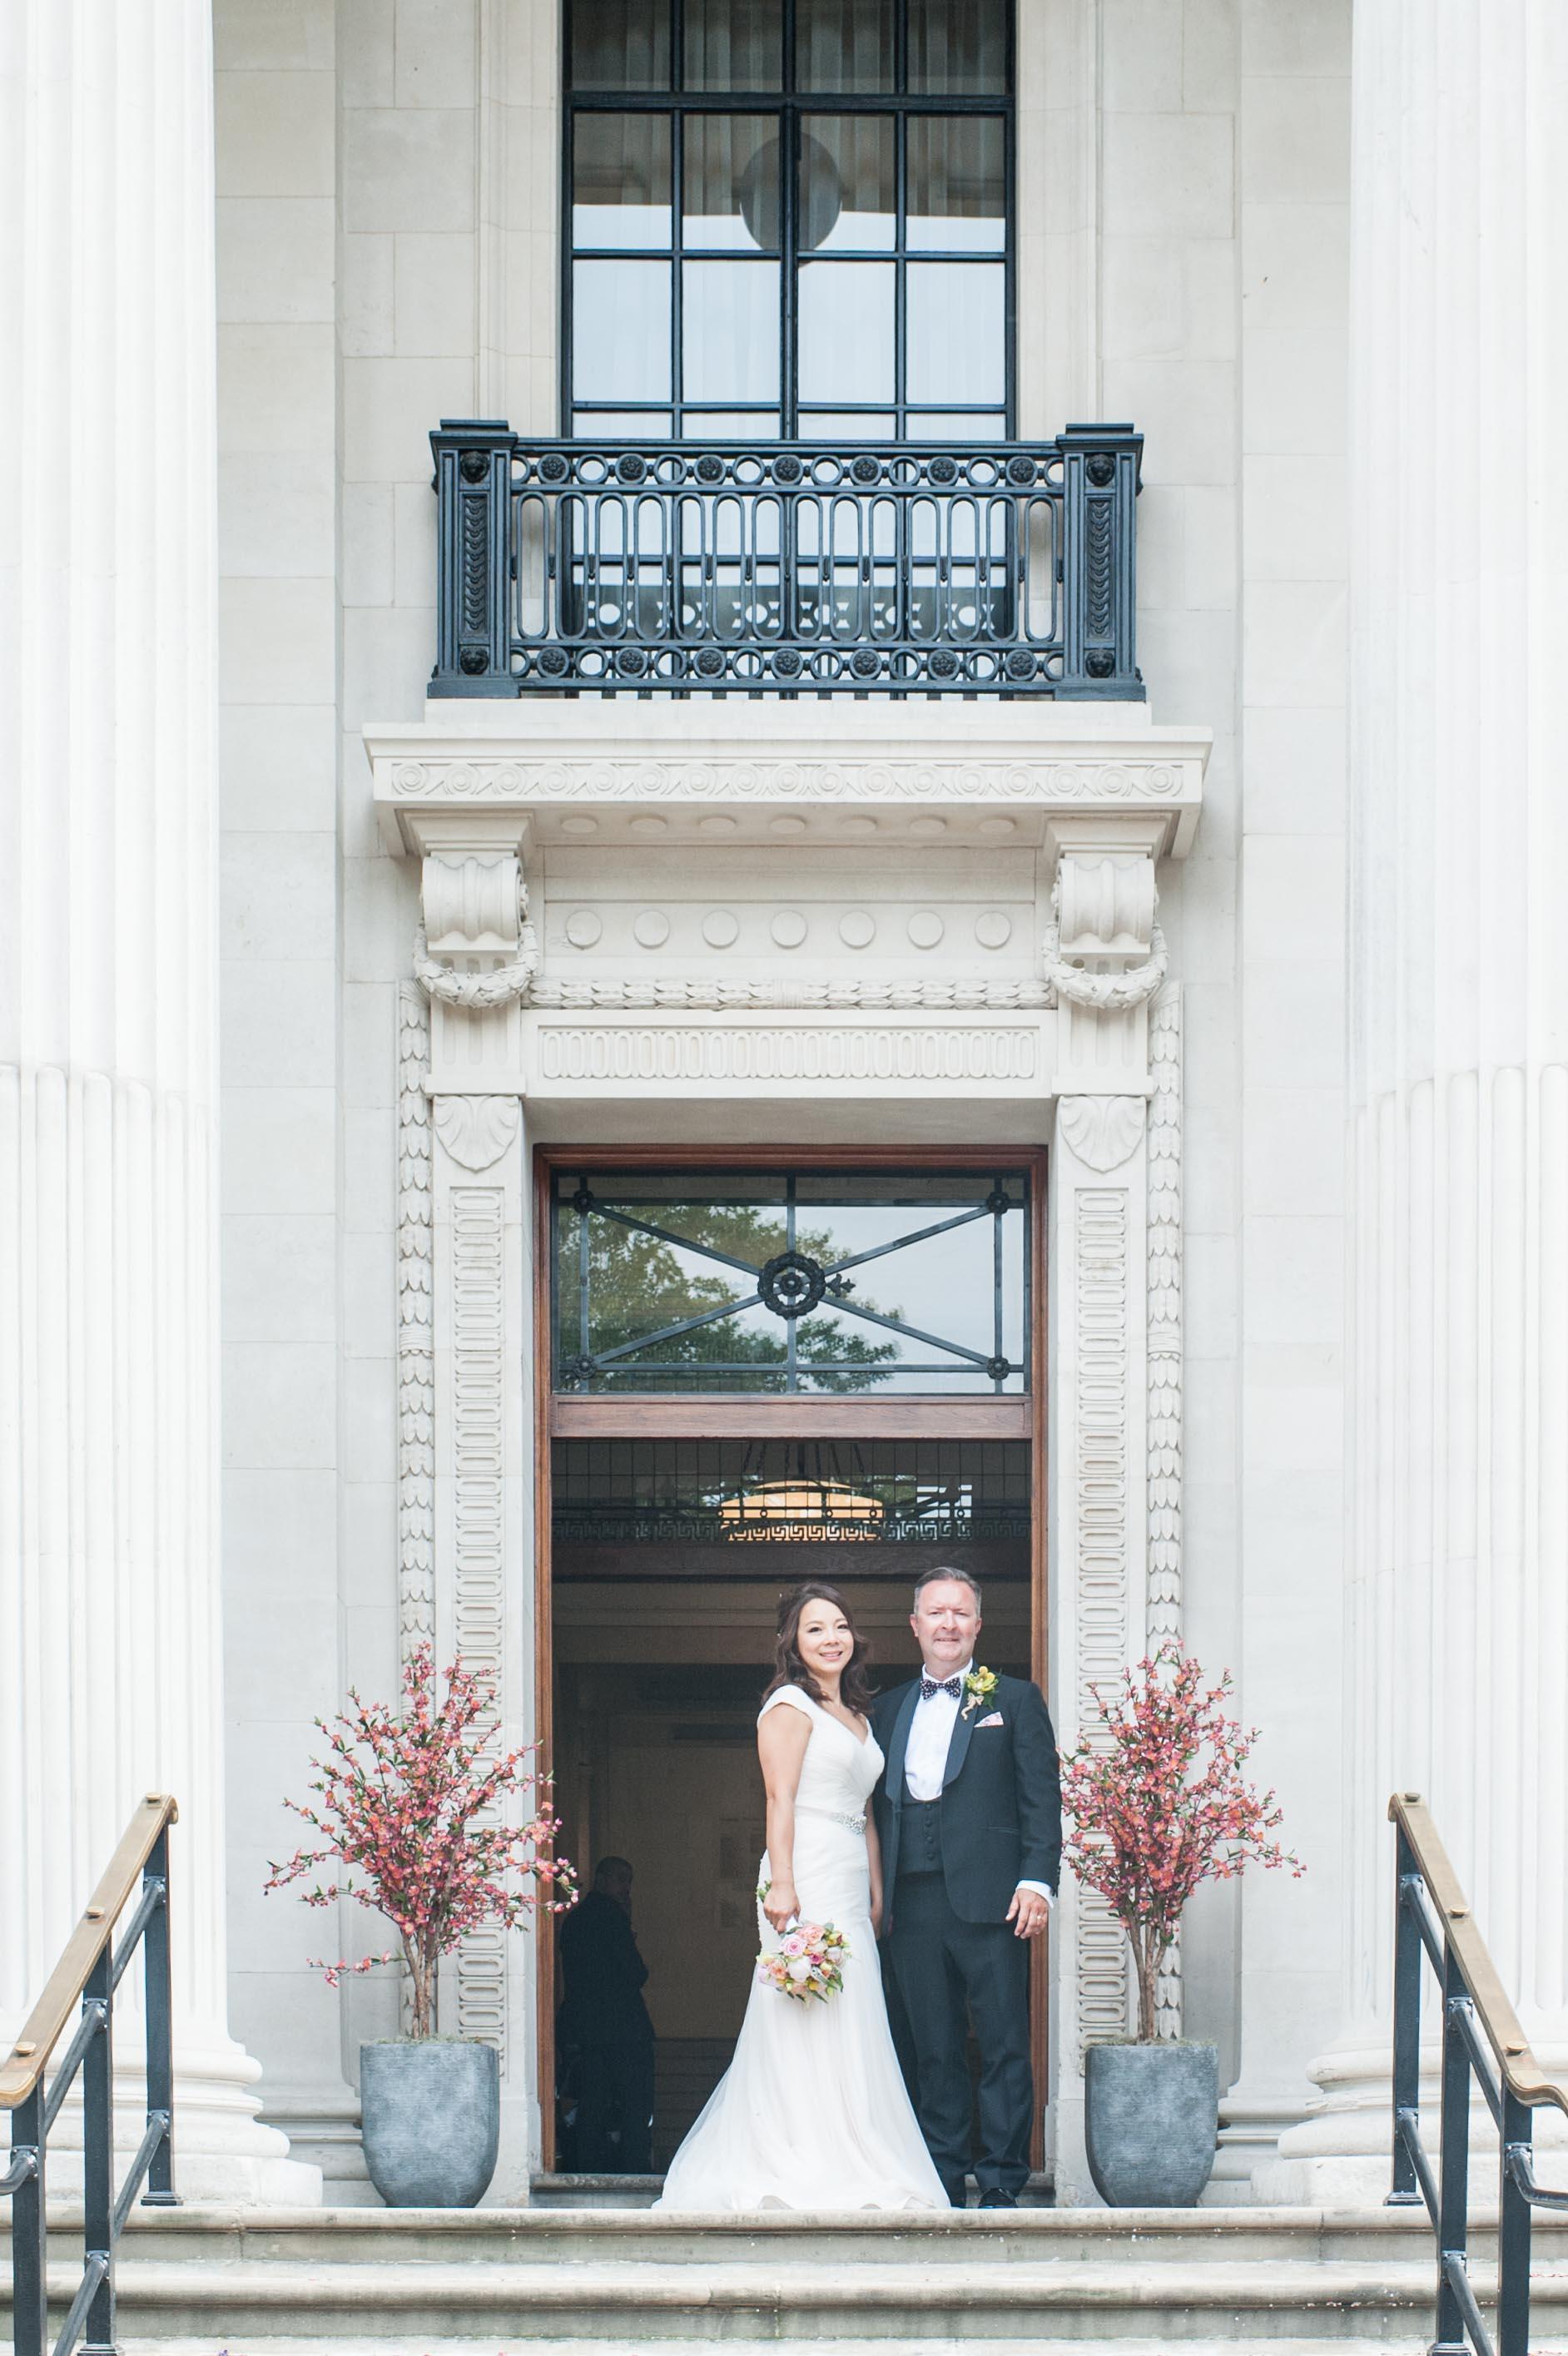 D&M_Marylebone Town Hall Wedding (140 of 239).jpg